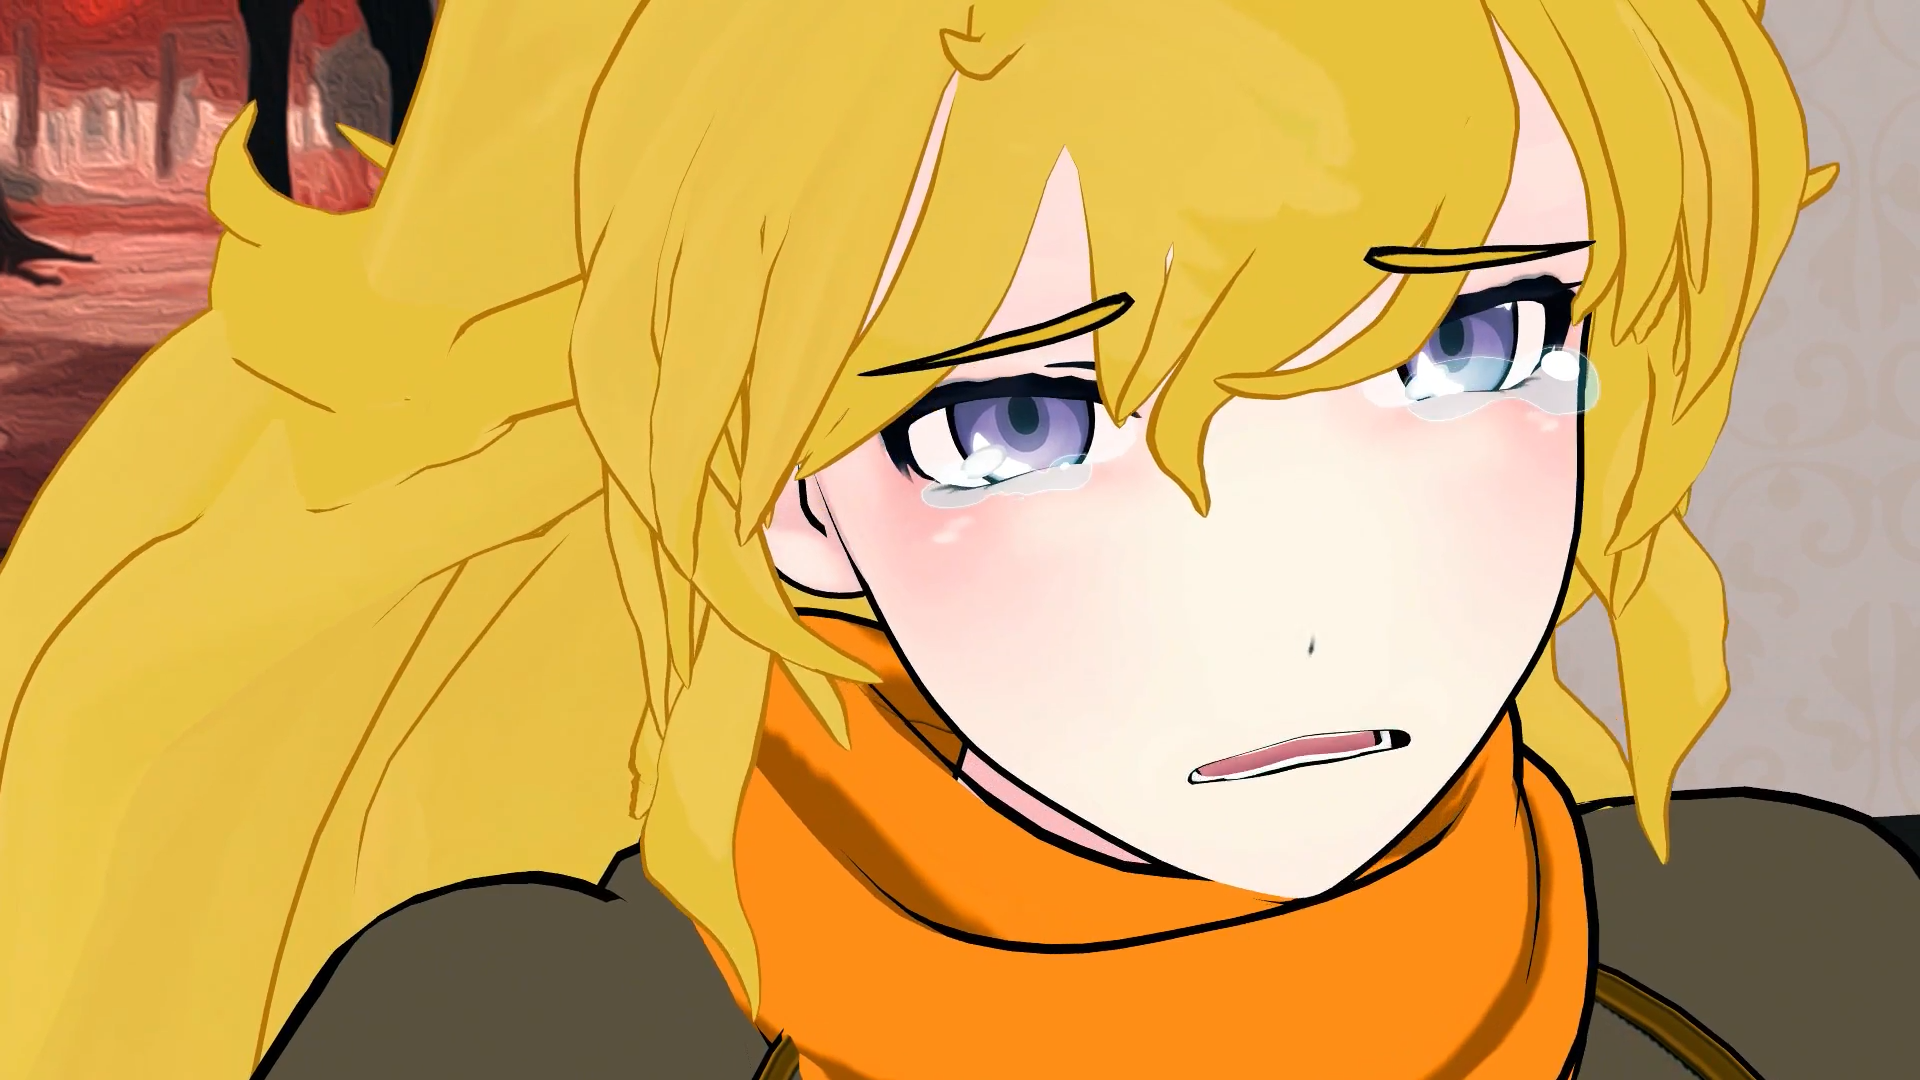 Yang xiao long weiss schnee yellow cartoon human hair color anime facial expression nose eye head